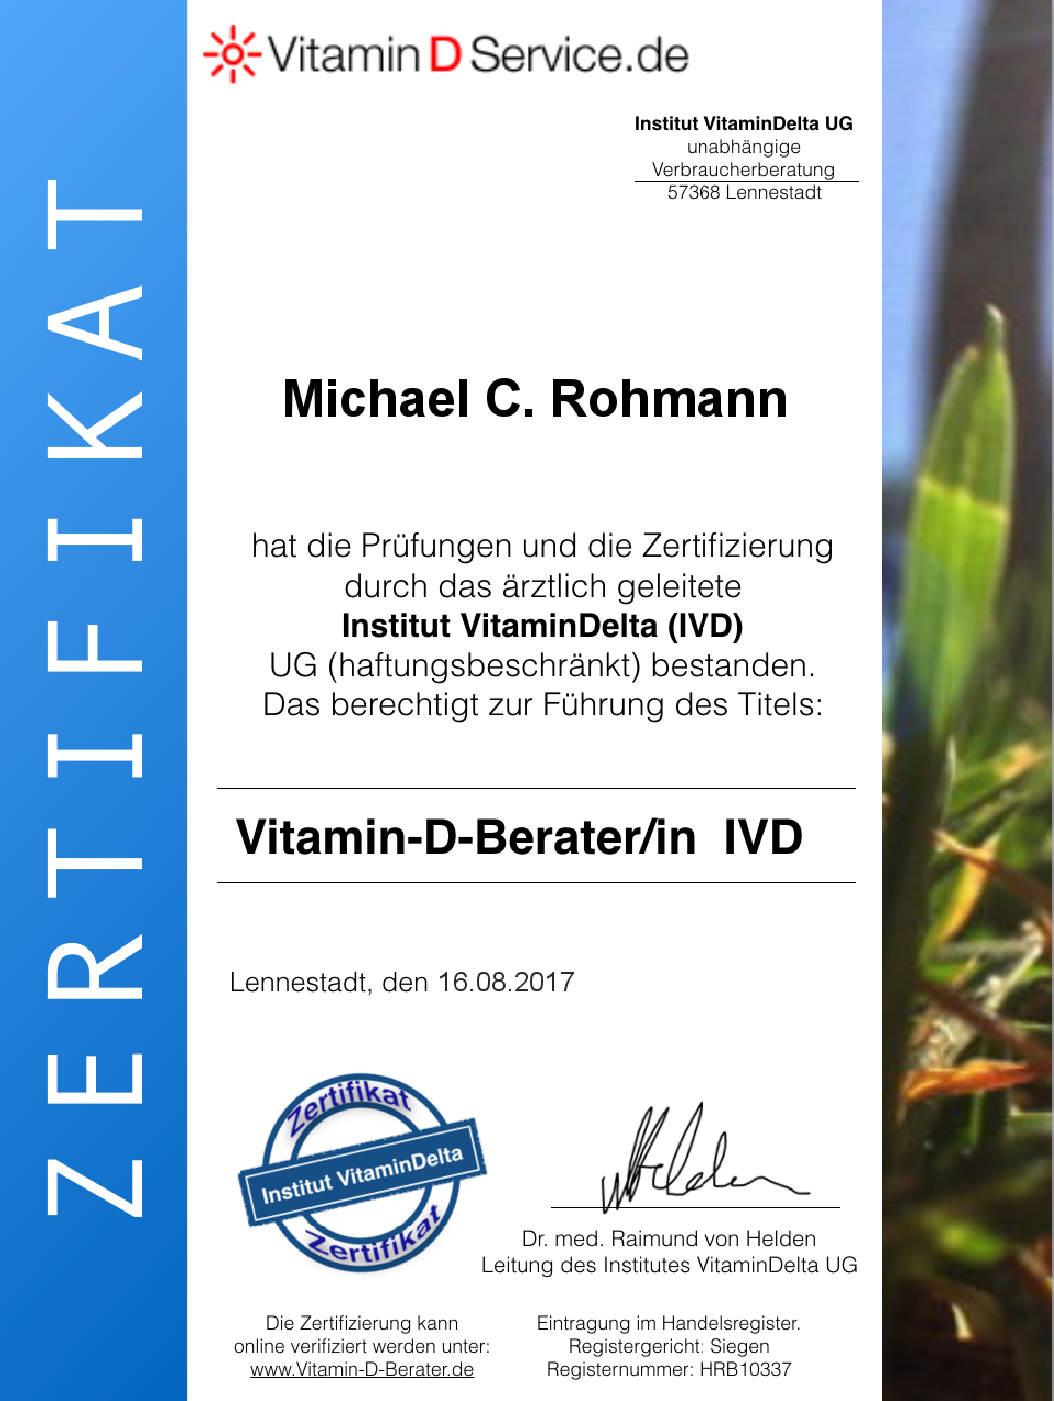 Michael Rohmann Ernährungsberatung Mannheim Zertifikat Vitamin D Beratung